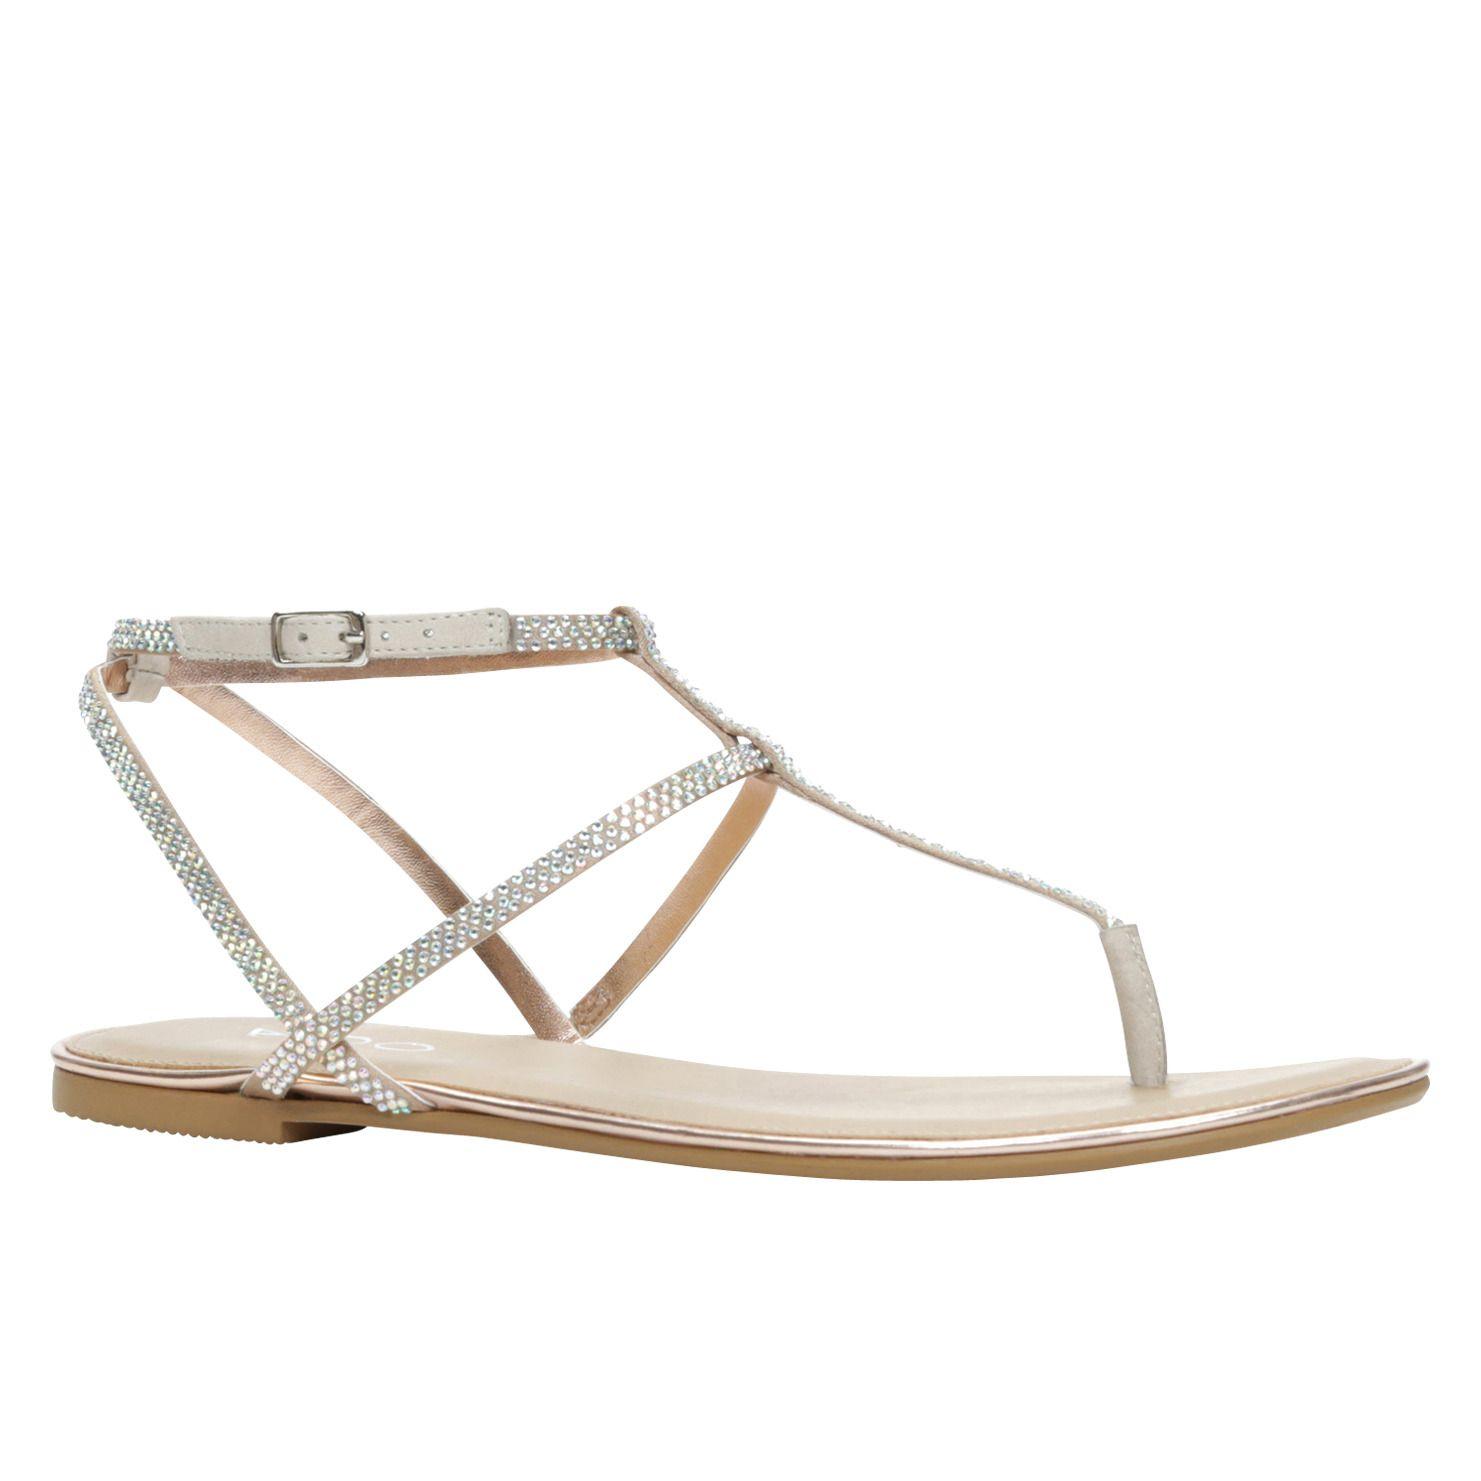 flats sandals for sale at ALDO Shoes